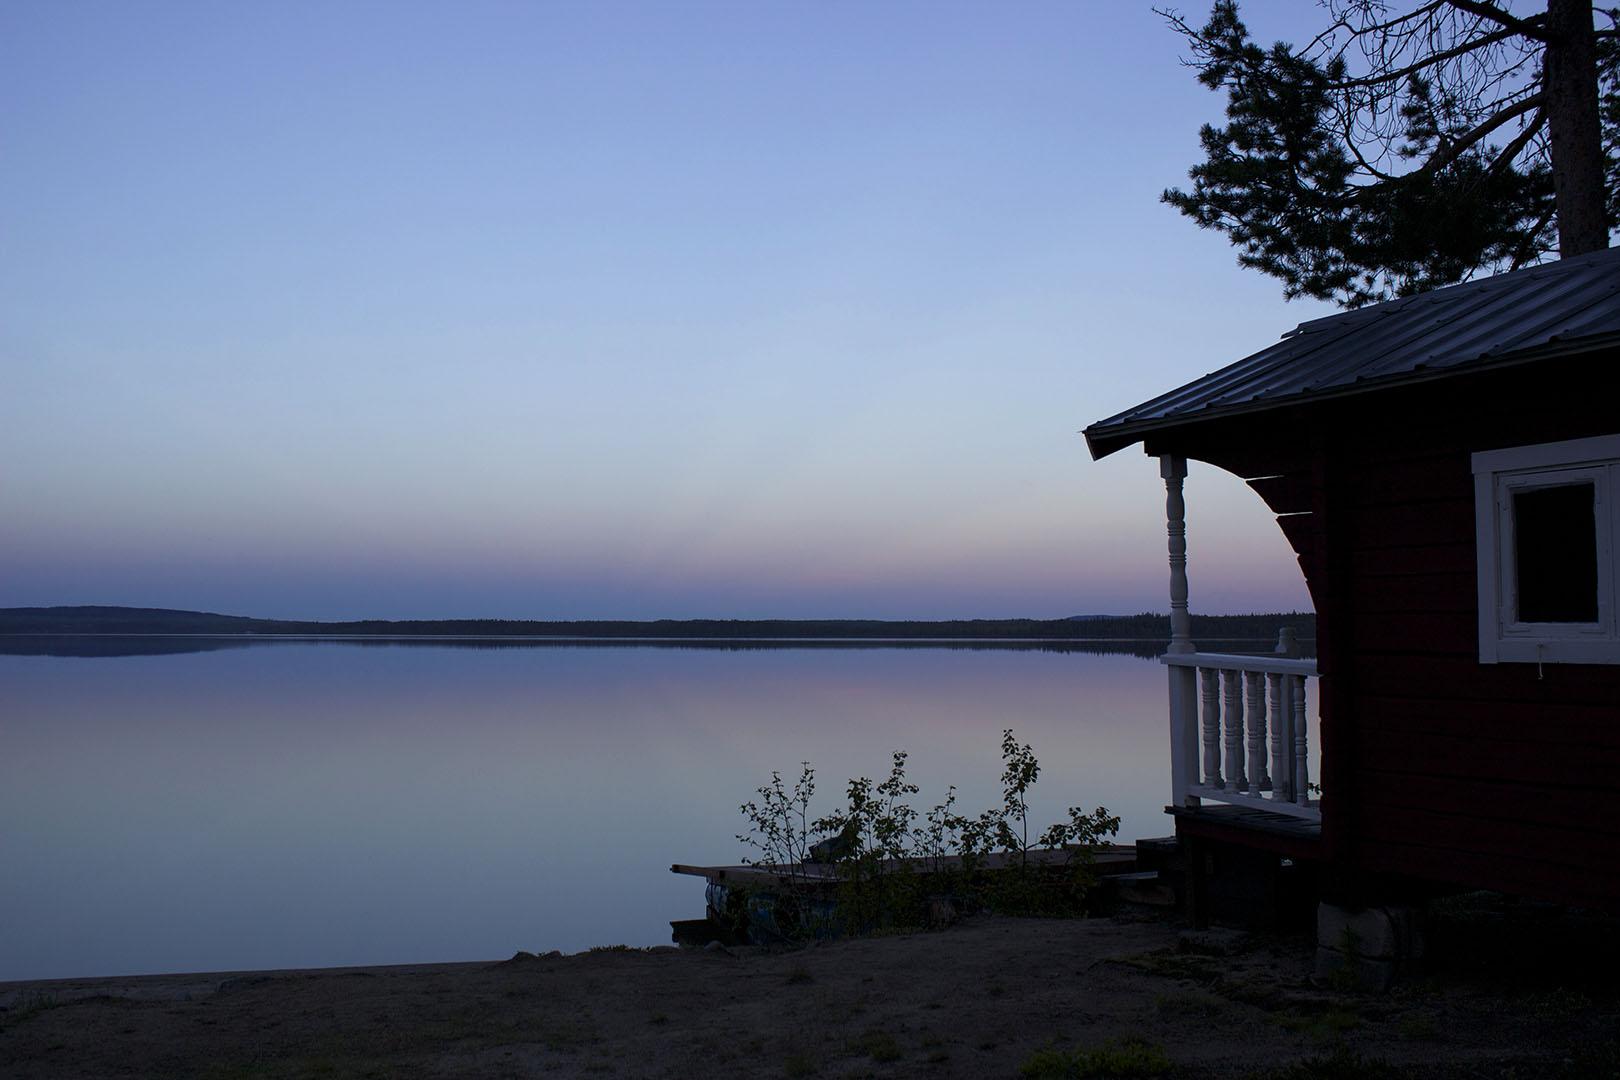 Sandsjögården, Glorious autumn in the Swedish wilderness, cabin and the lake, Scan Magazine